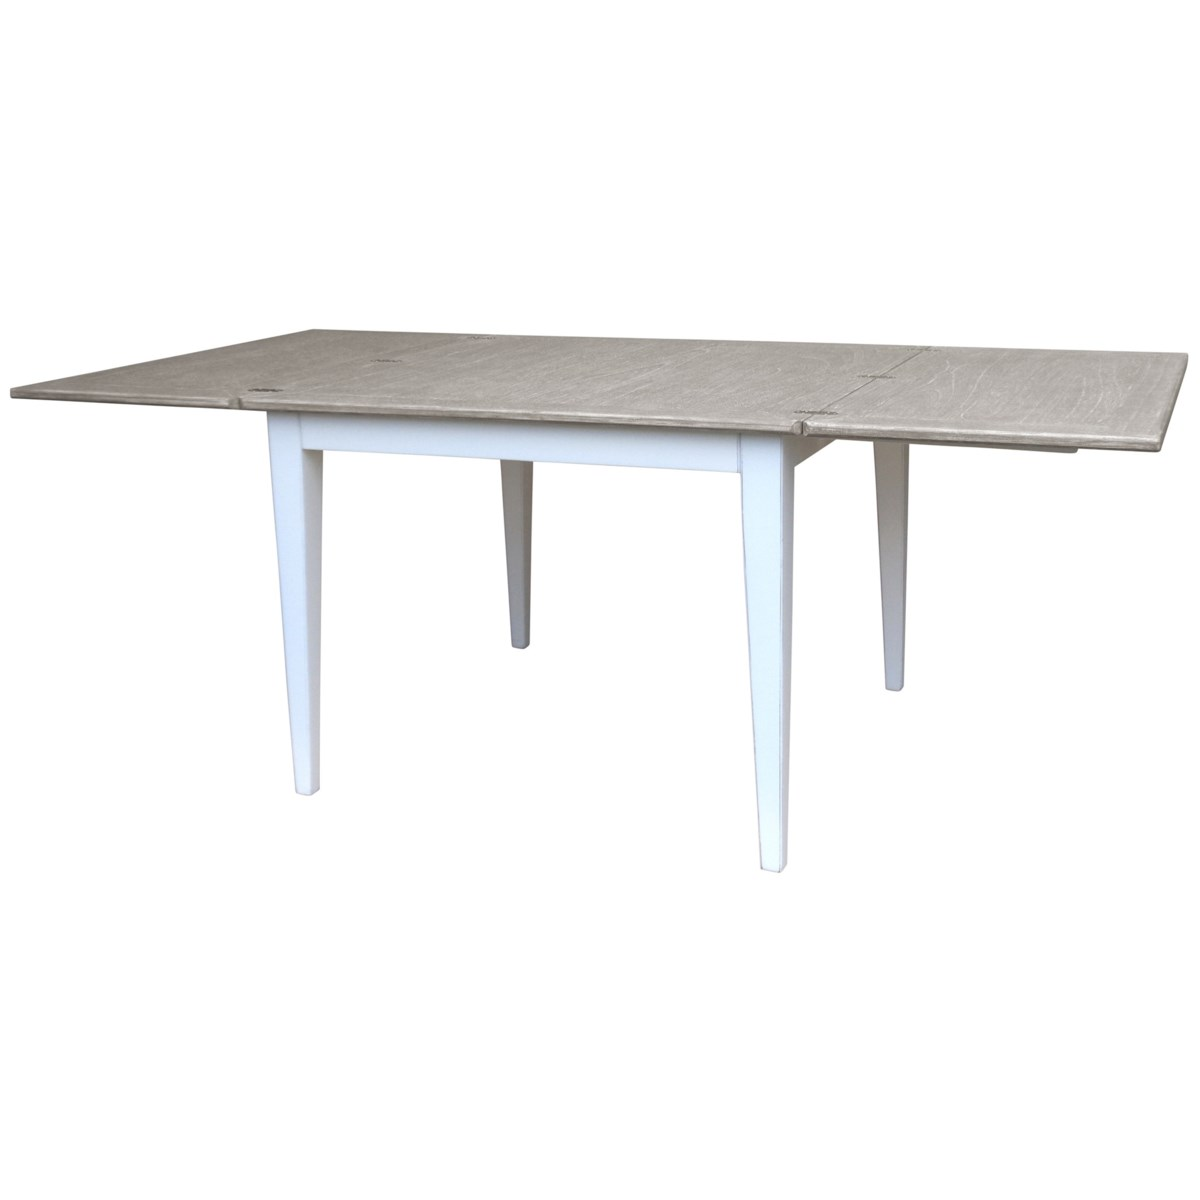 EASTON BREAKFAST TABLE - 15RW+